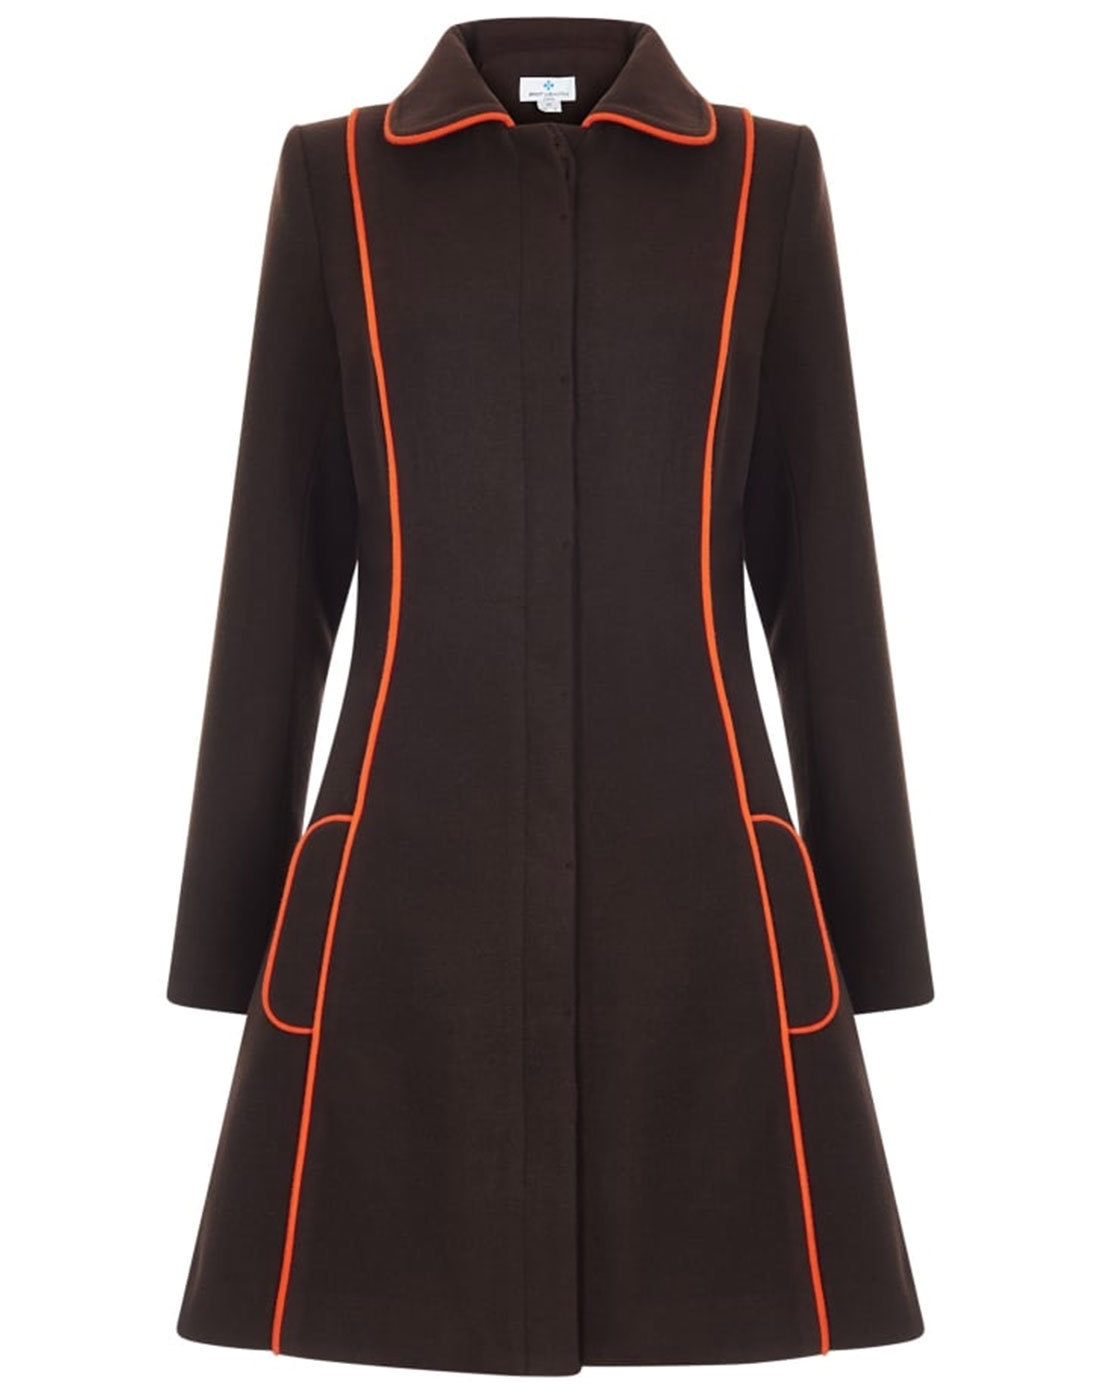 Ava BRIGHT & BEAUTIFUL 60s Mod Piped Trim Coat